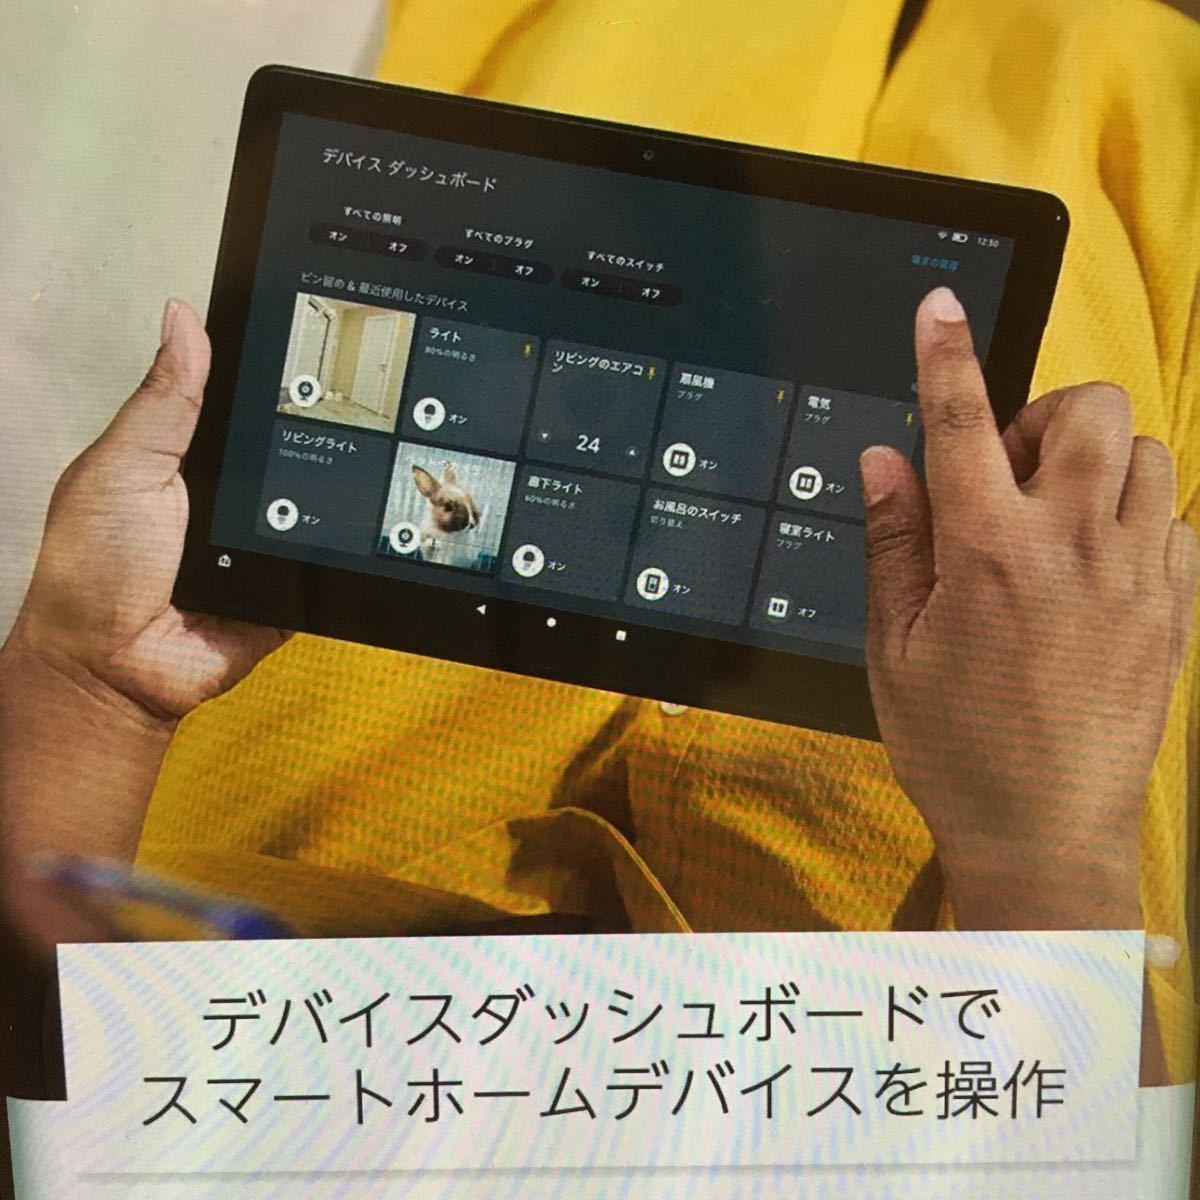 Amazon Fire HD 10 32GB■エッセンシャルセット■新品・未開封■お得■新型■キーボード&Microsoft 365付き■_画像6